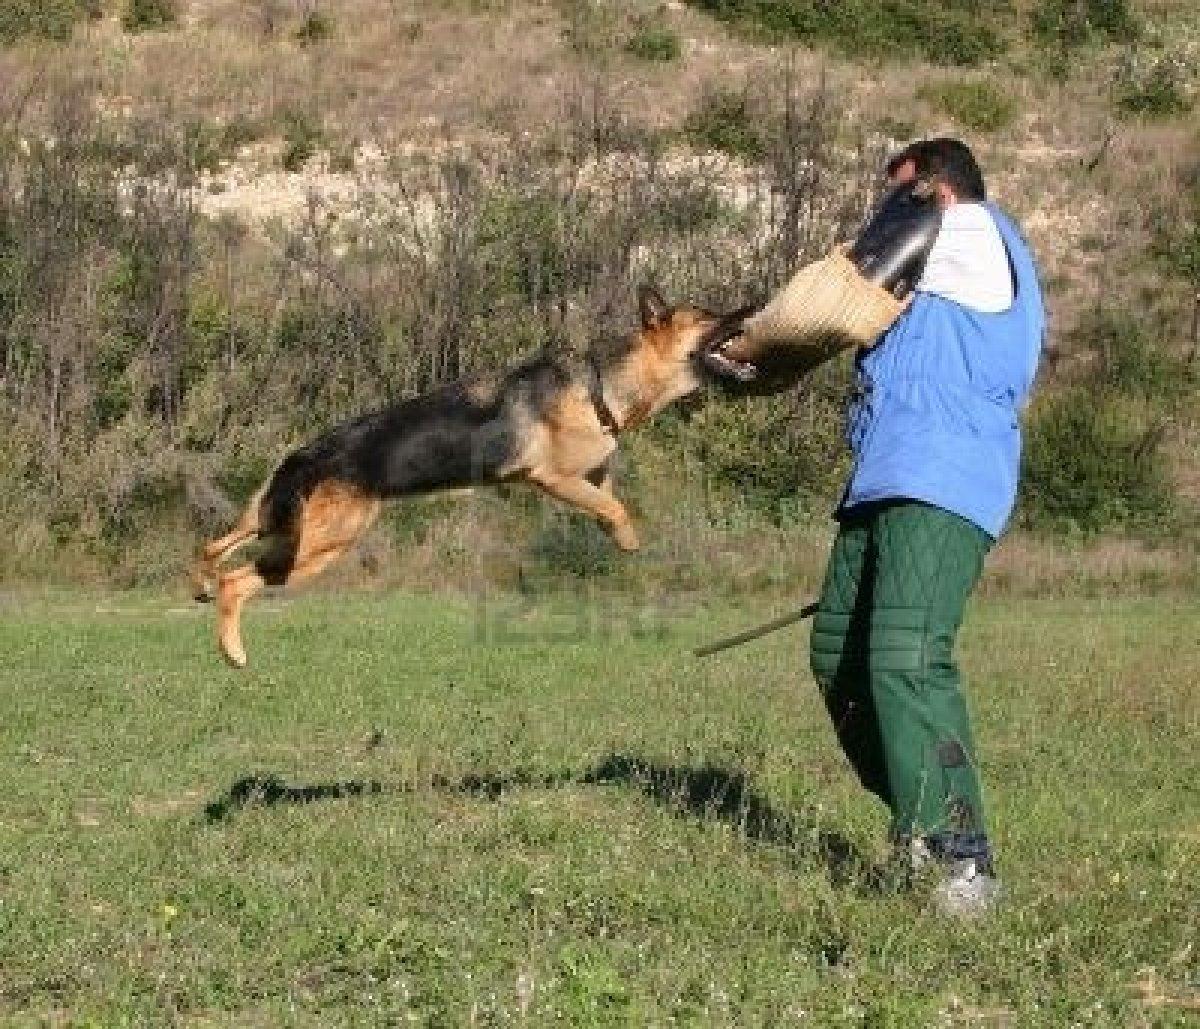 German B Shepherd B Attack B People B Images B